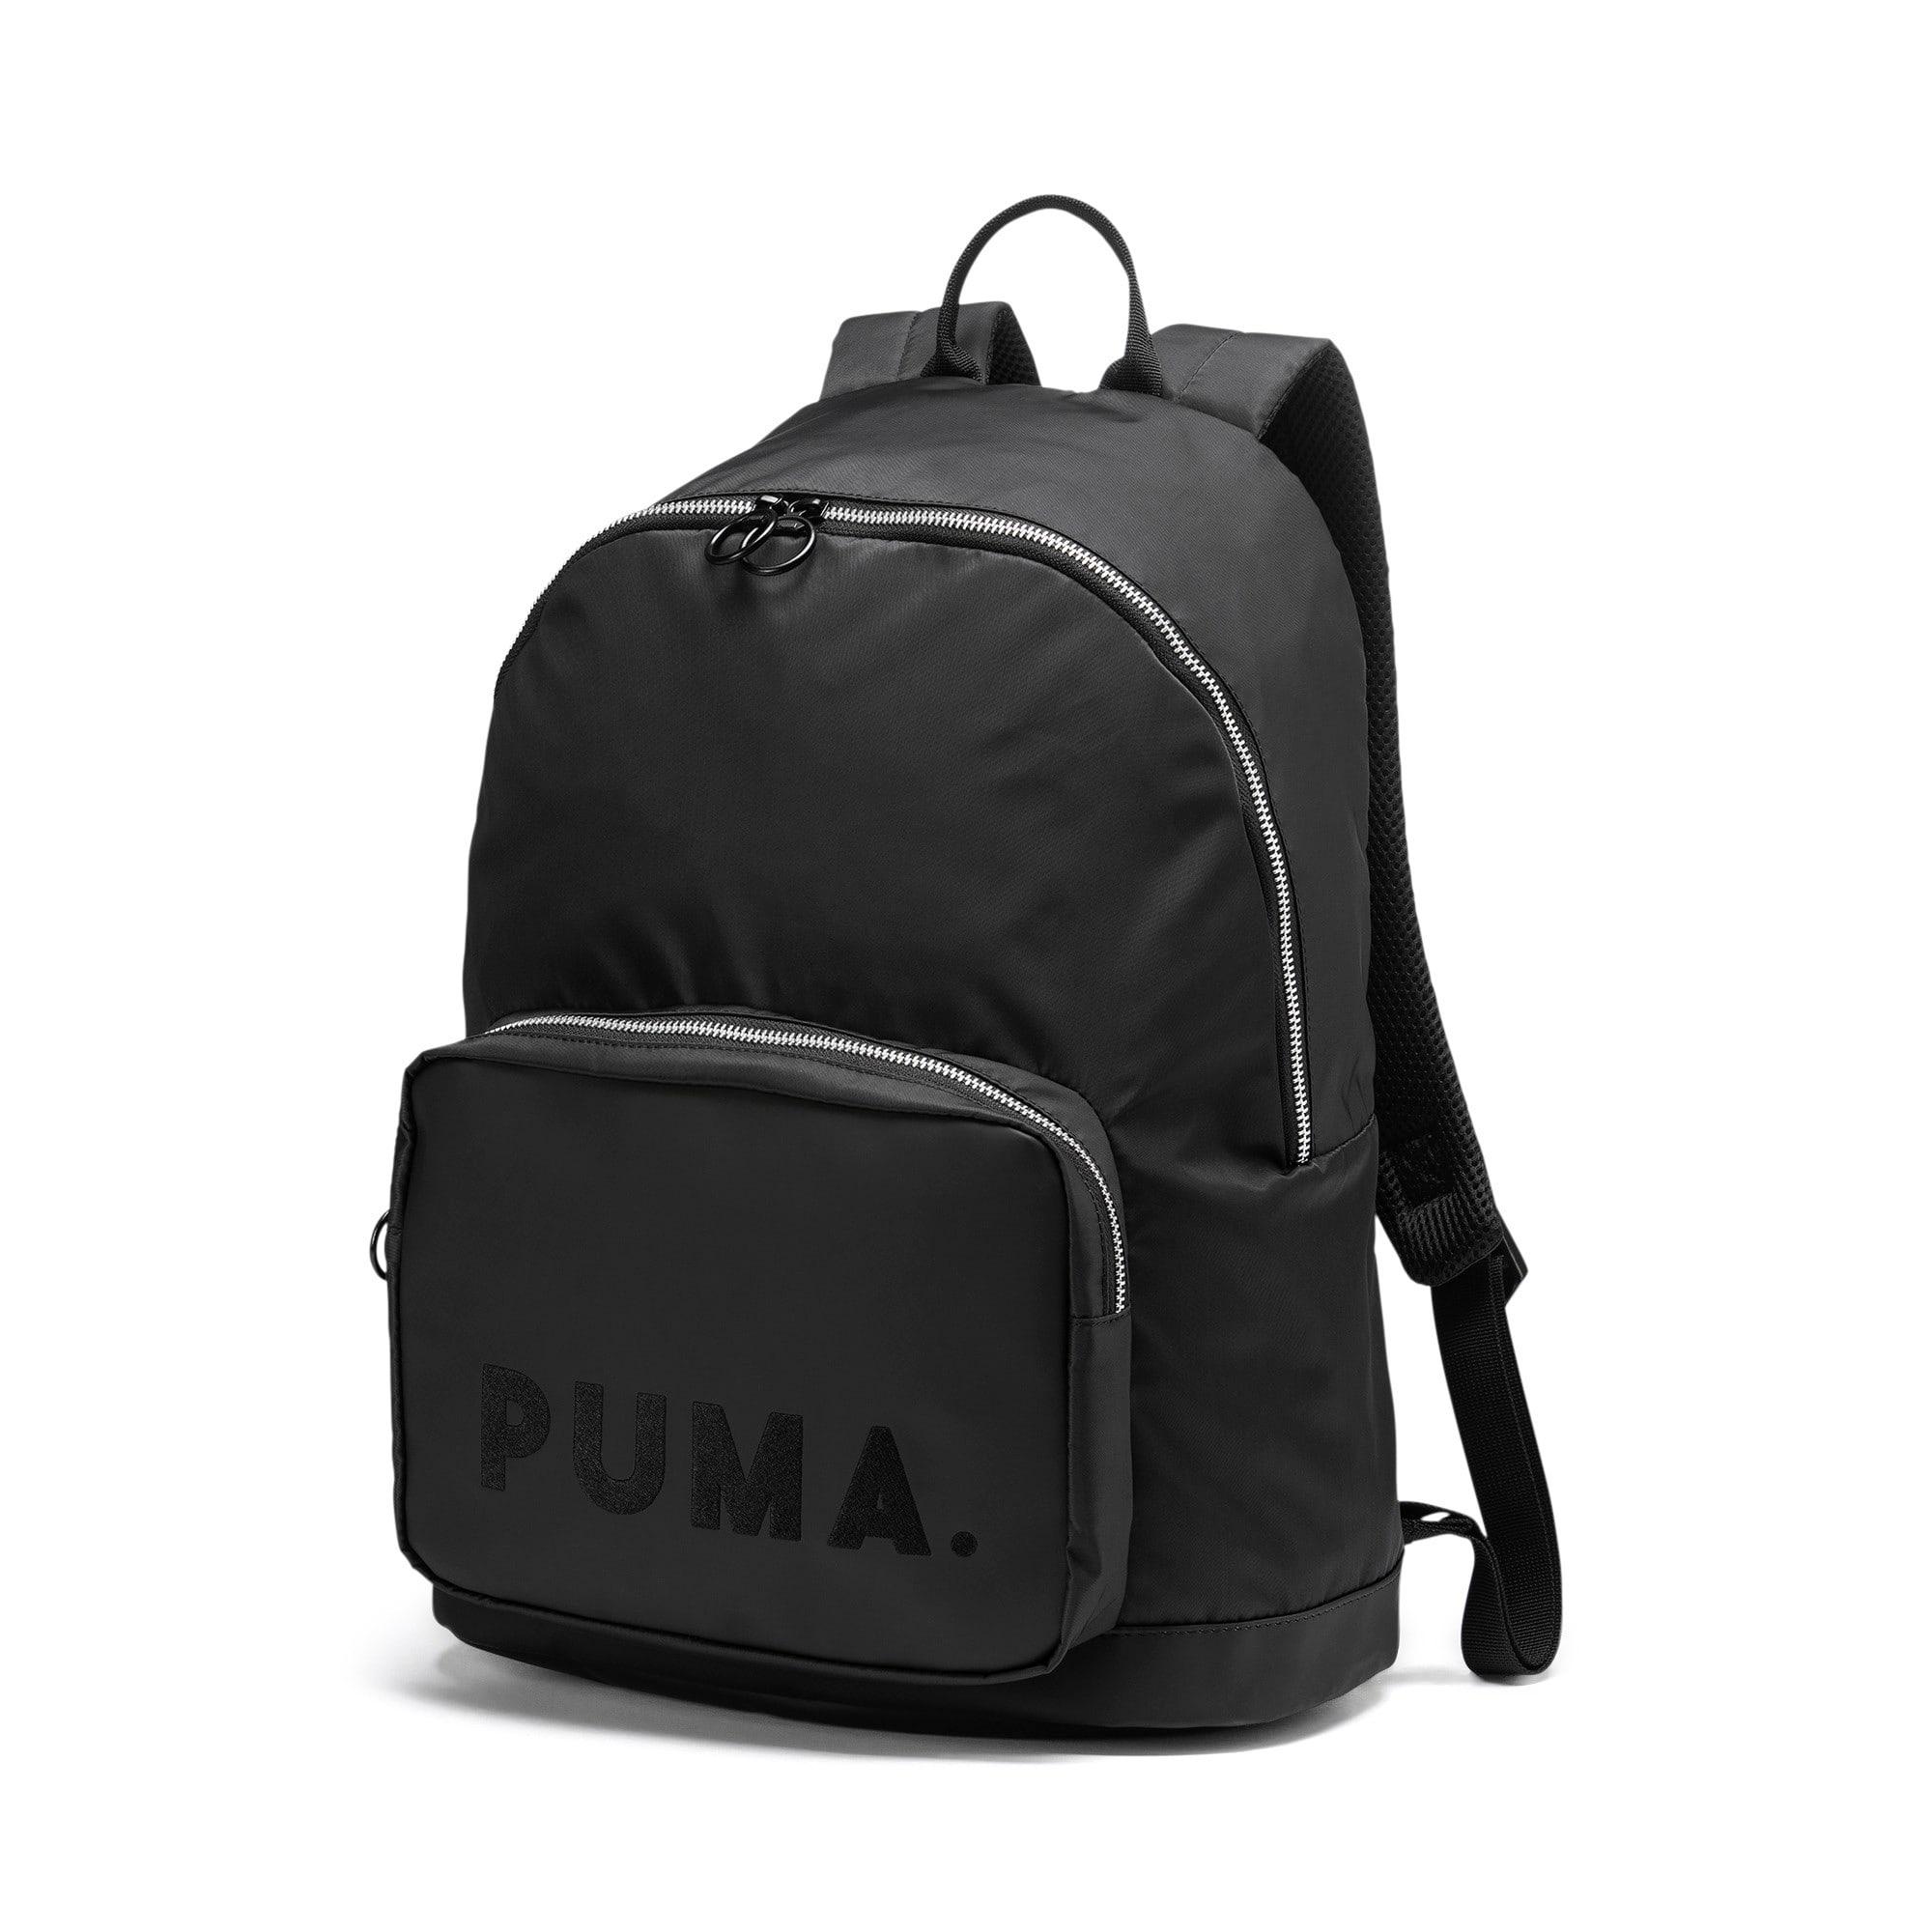 Thumbnail 1 of オリジナルス バックパック トレンド 24L, Puma Black, medium-JPN